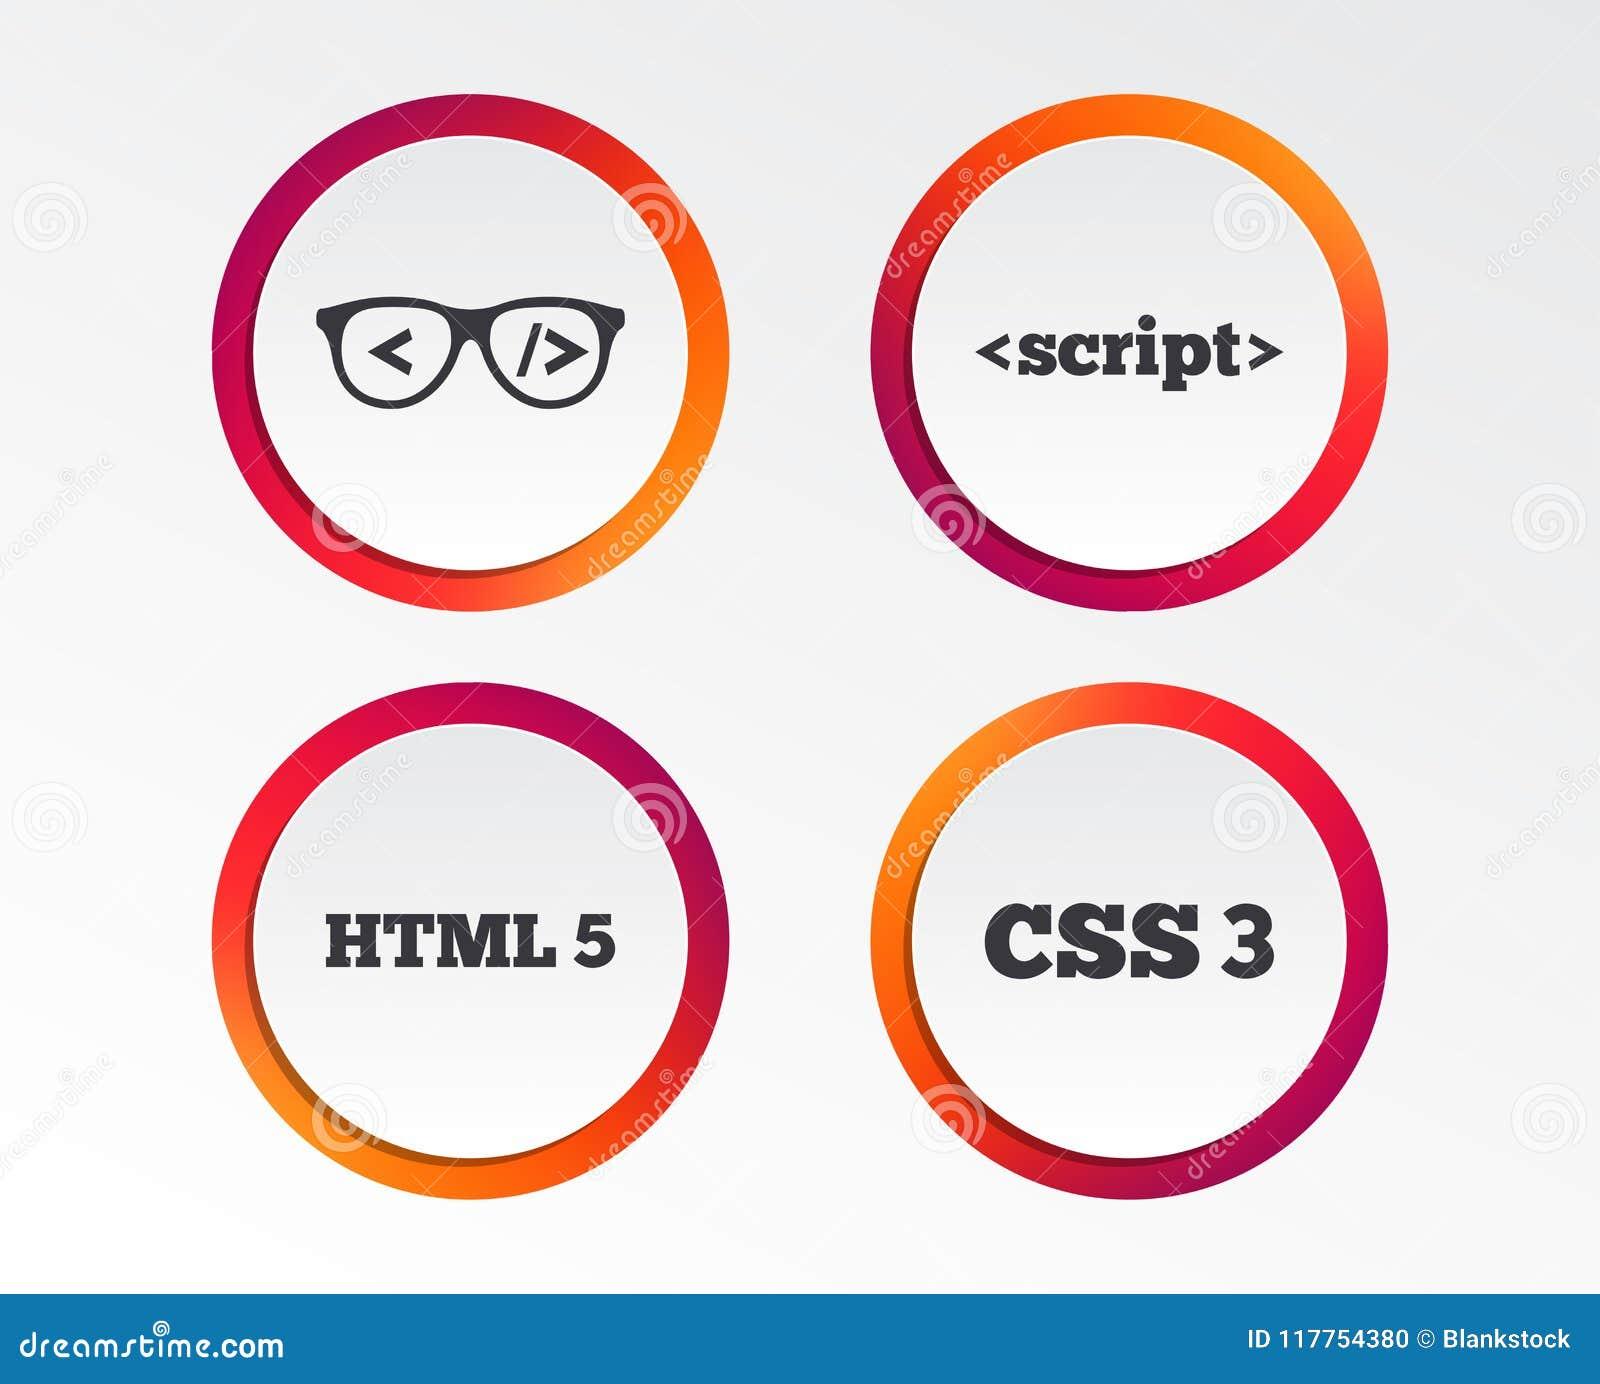 Programmer Coder Glasses  HTML Markup Language  Stock Vector